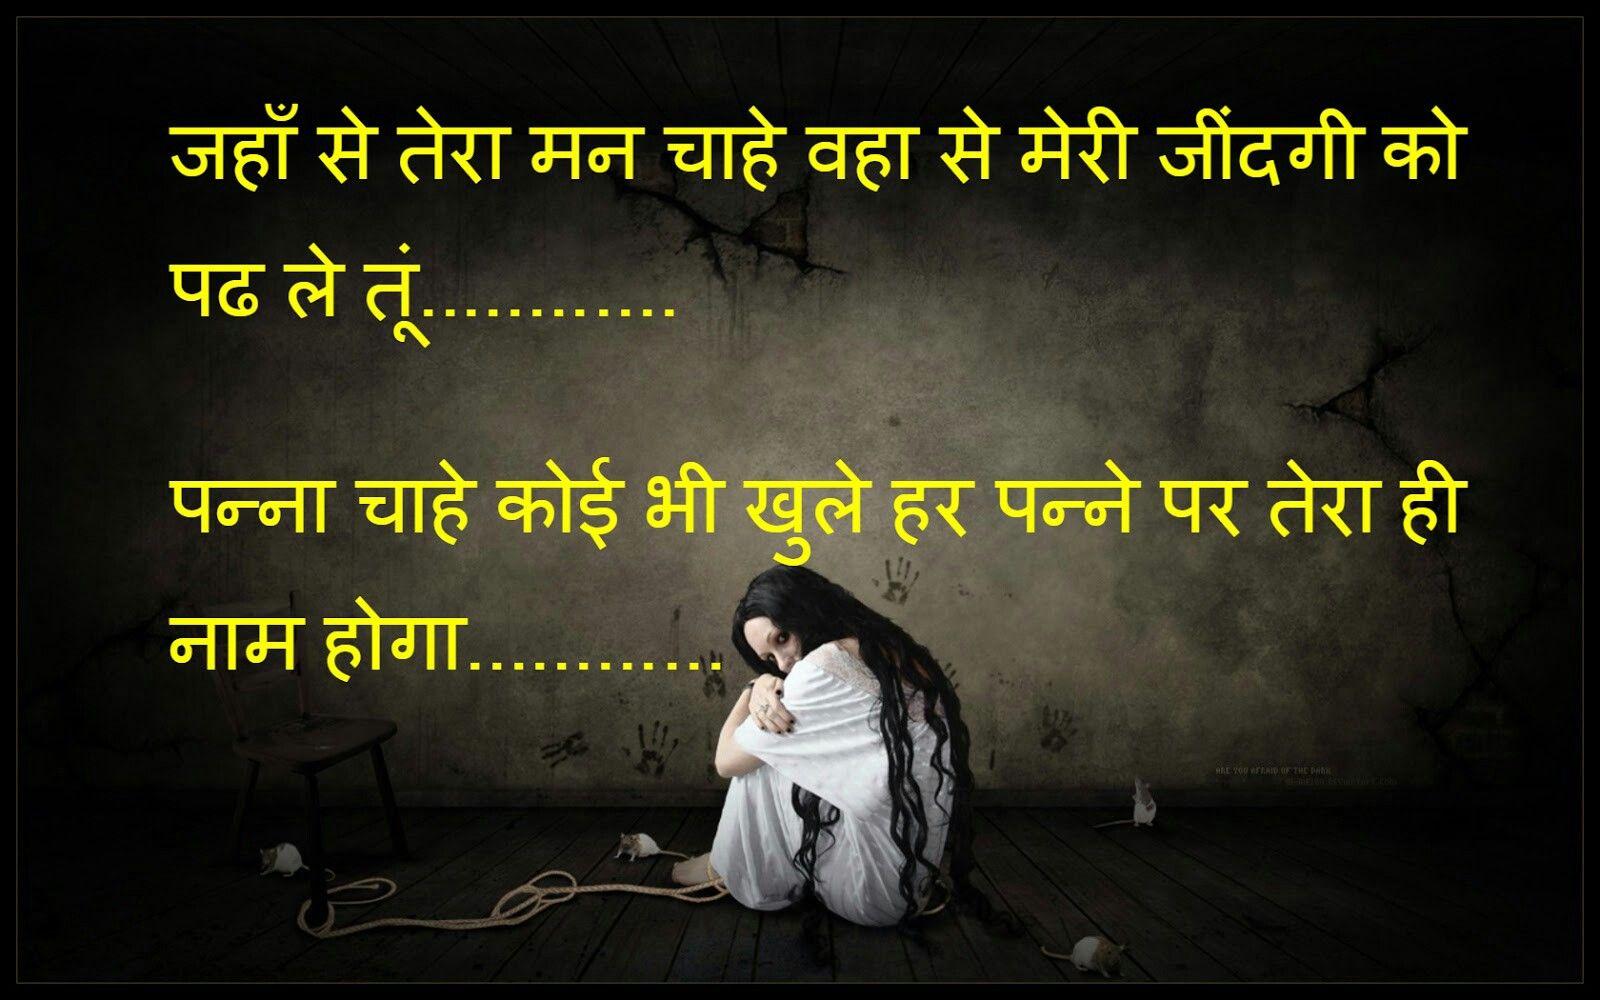 Pin By Manoj Kumar On Shayari Love Quotes For Her Love Quotes For Him Romantic Love Quotes With Images